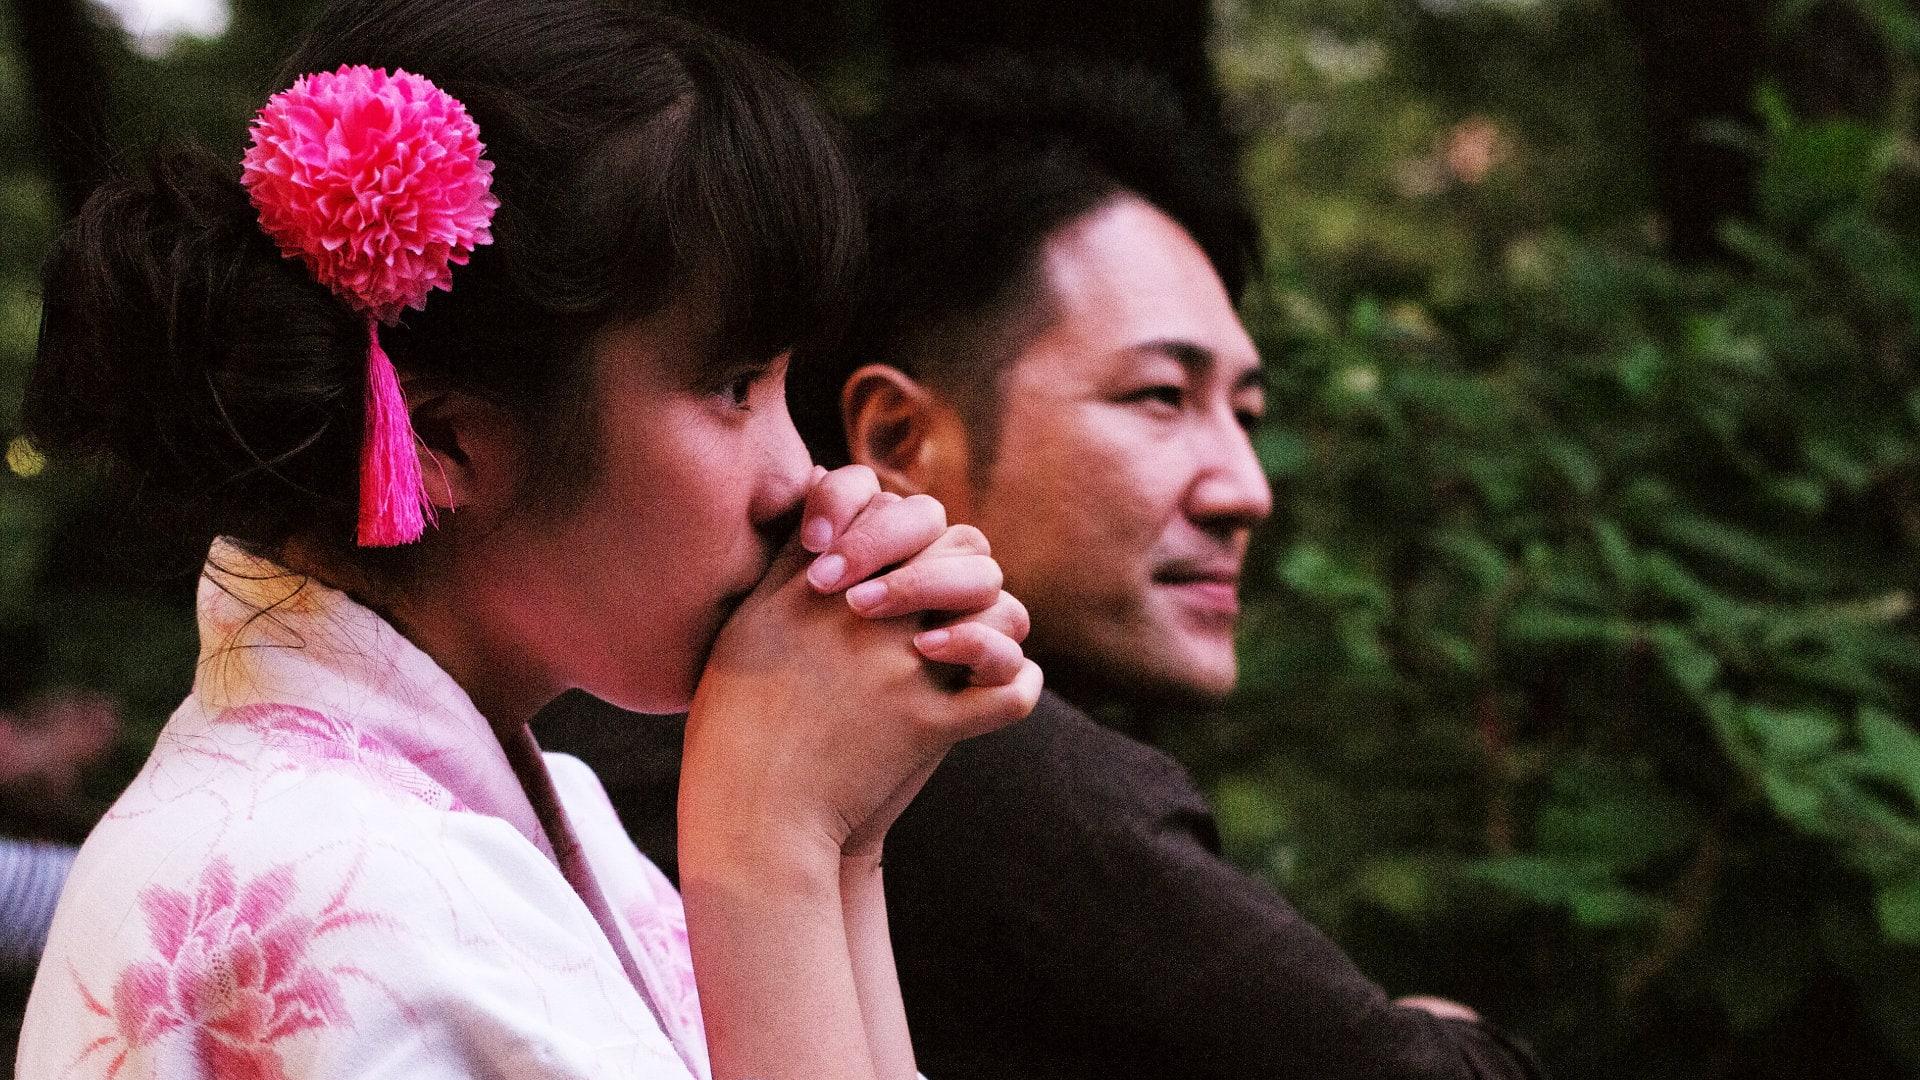 Ishii Yuichi et Mahiro Tanimoto dans Family Romance LLC